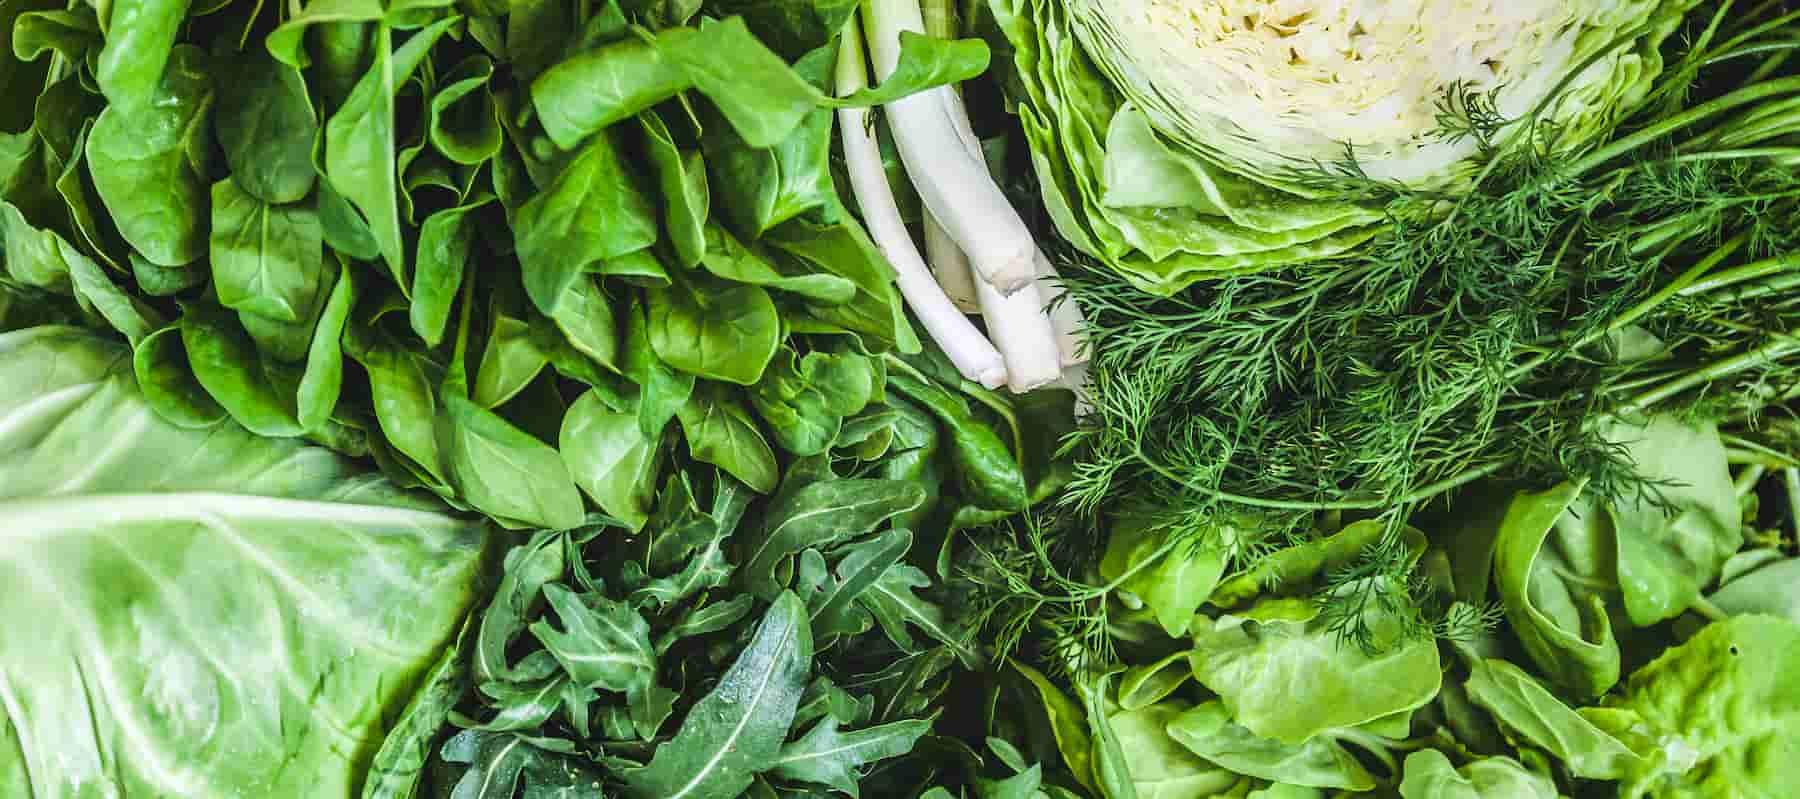 Food that improve vision